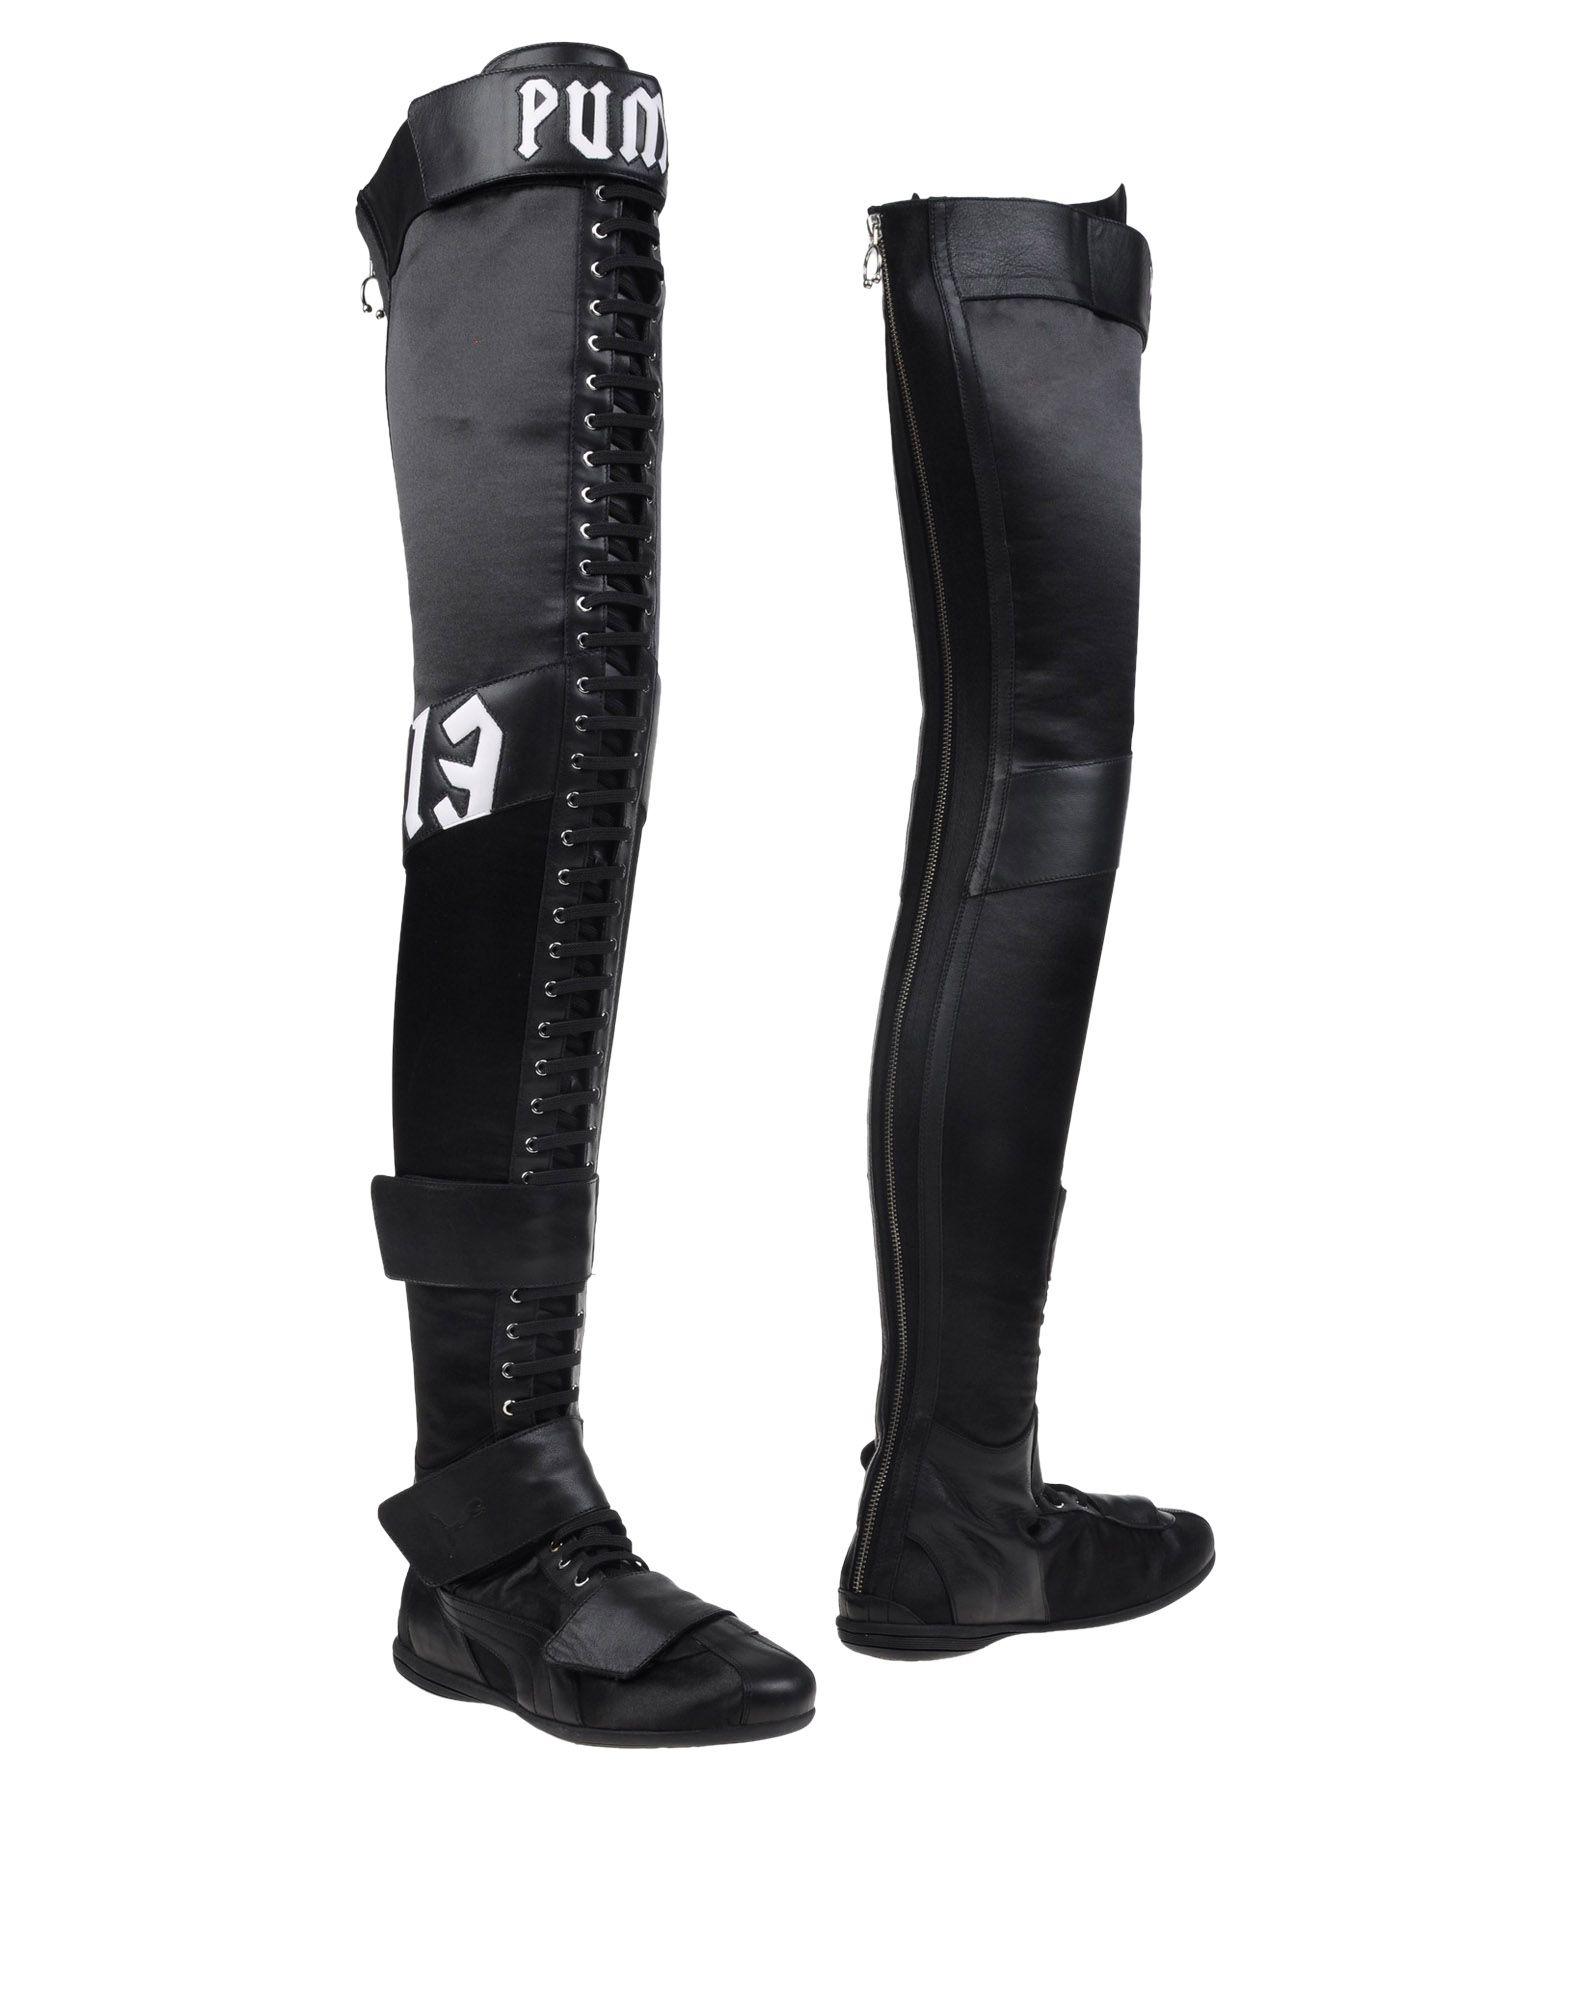 super popular b2153 dcc2a FENTY PUMA by RIHANNA Boots - Footwear | YOOX.COM